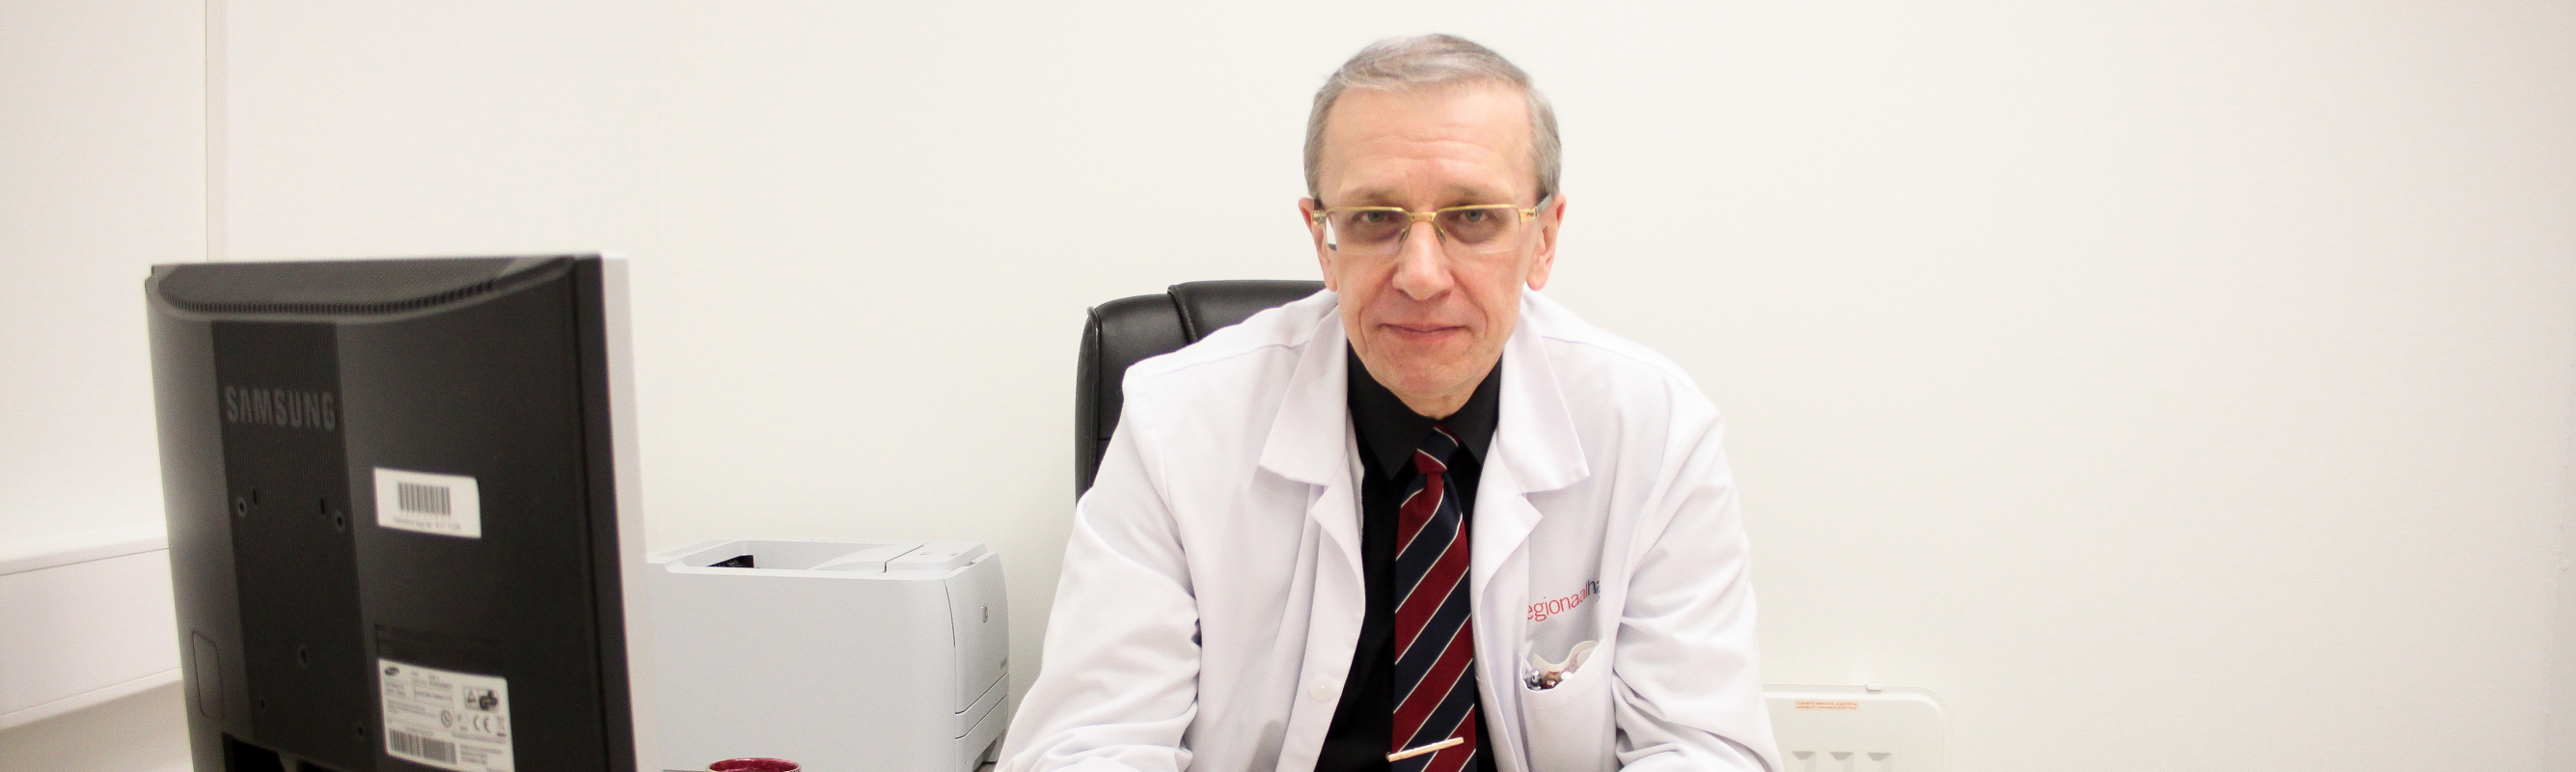 Onkoloogia- ja hematoloogiakliiniku juhataja dr Vahur Valvere